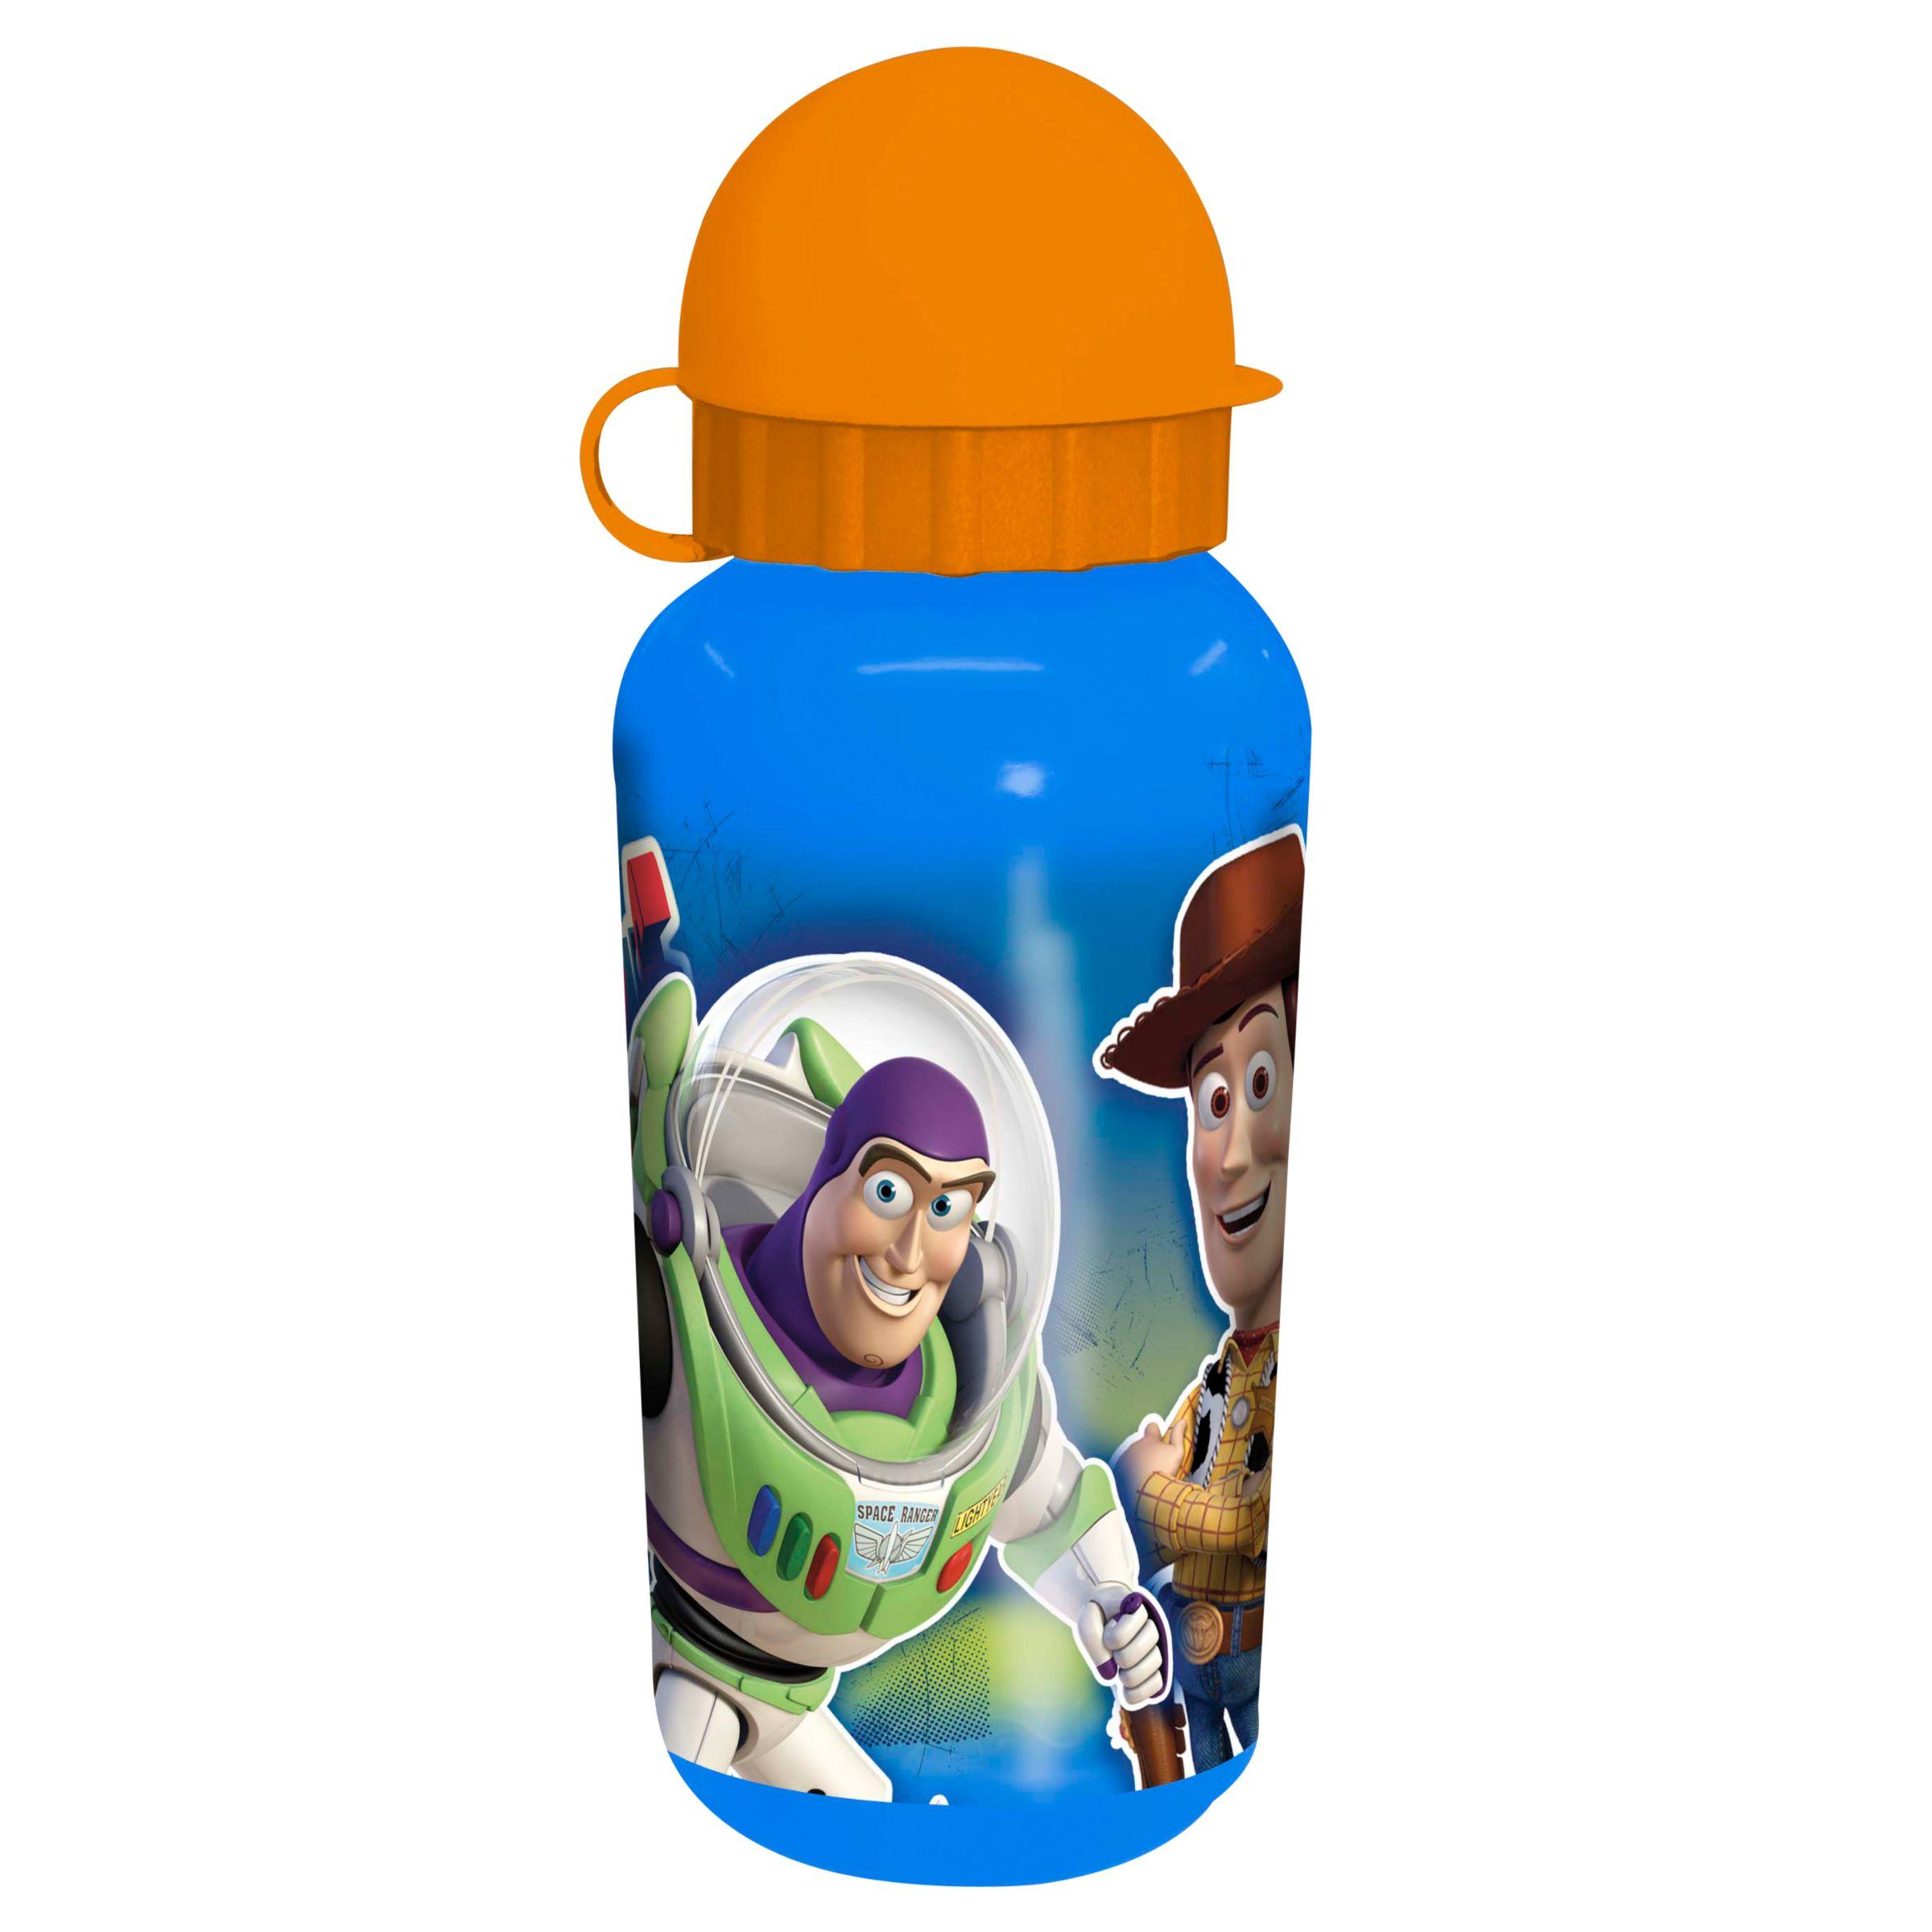 Toy Story Drinks Bottle